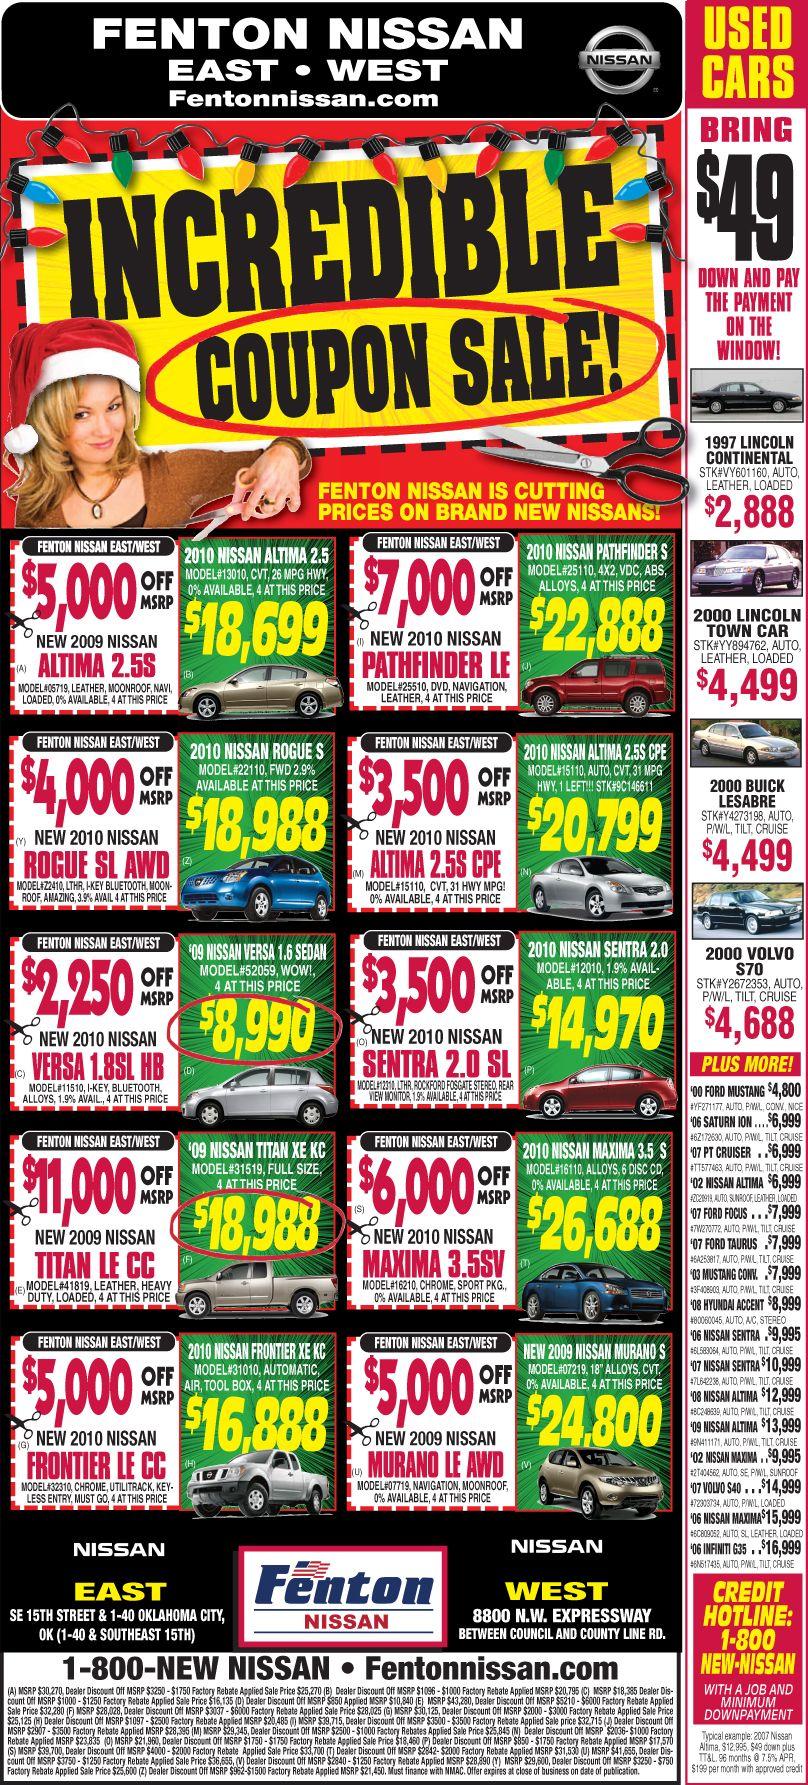 Coupon Sale Automotive Newspaper Layouts Pinterest – Coupon Layouts